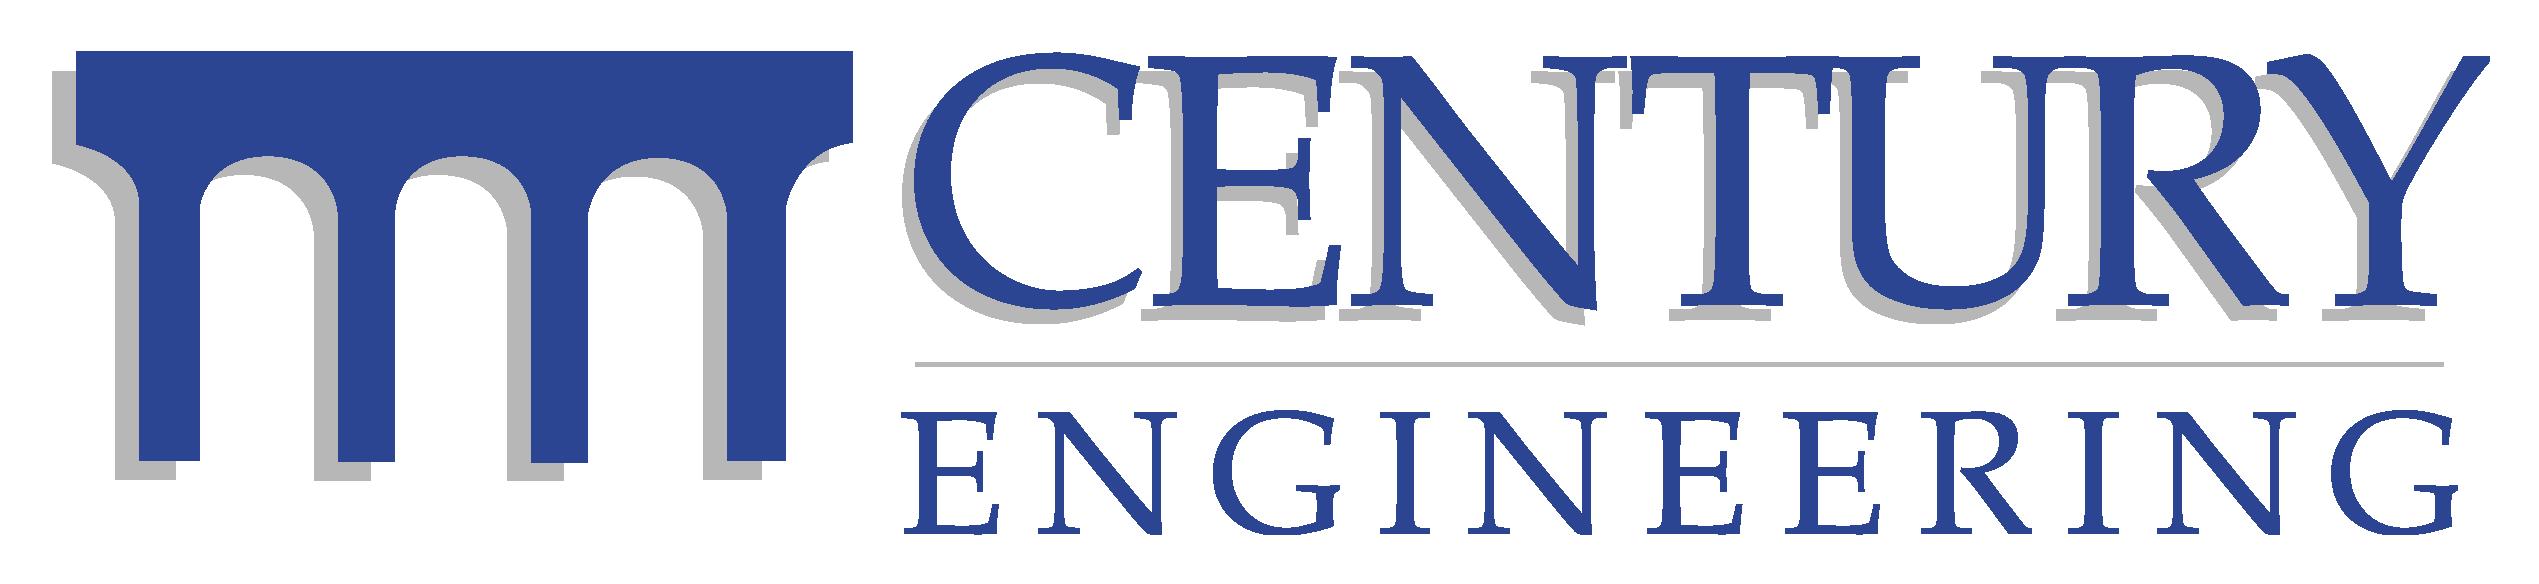 logo for Century